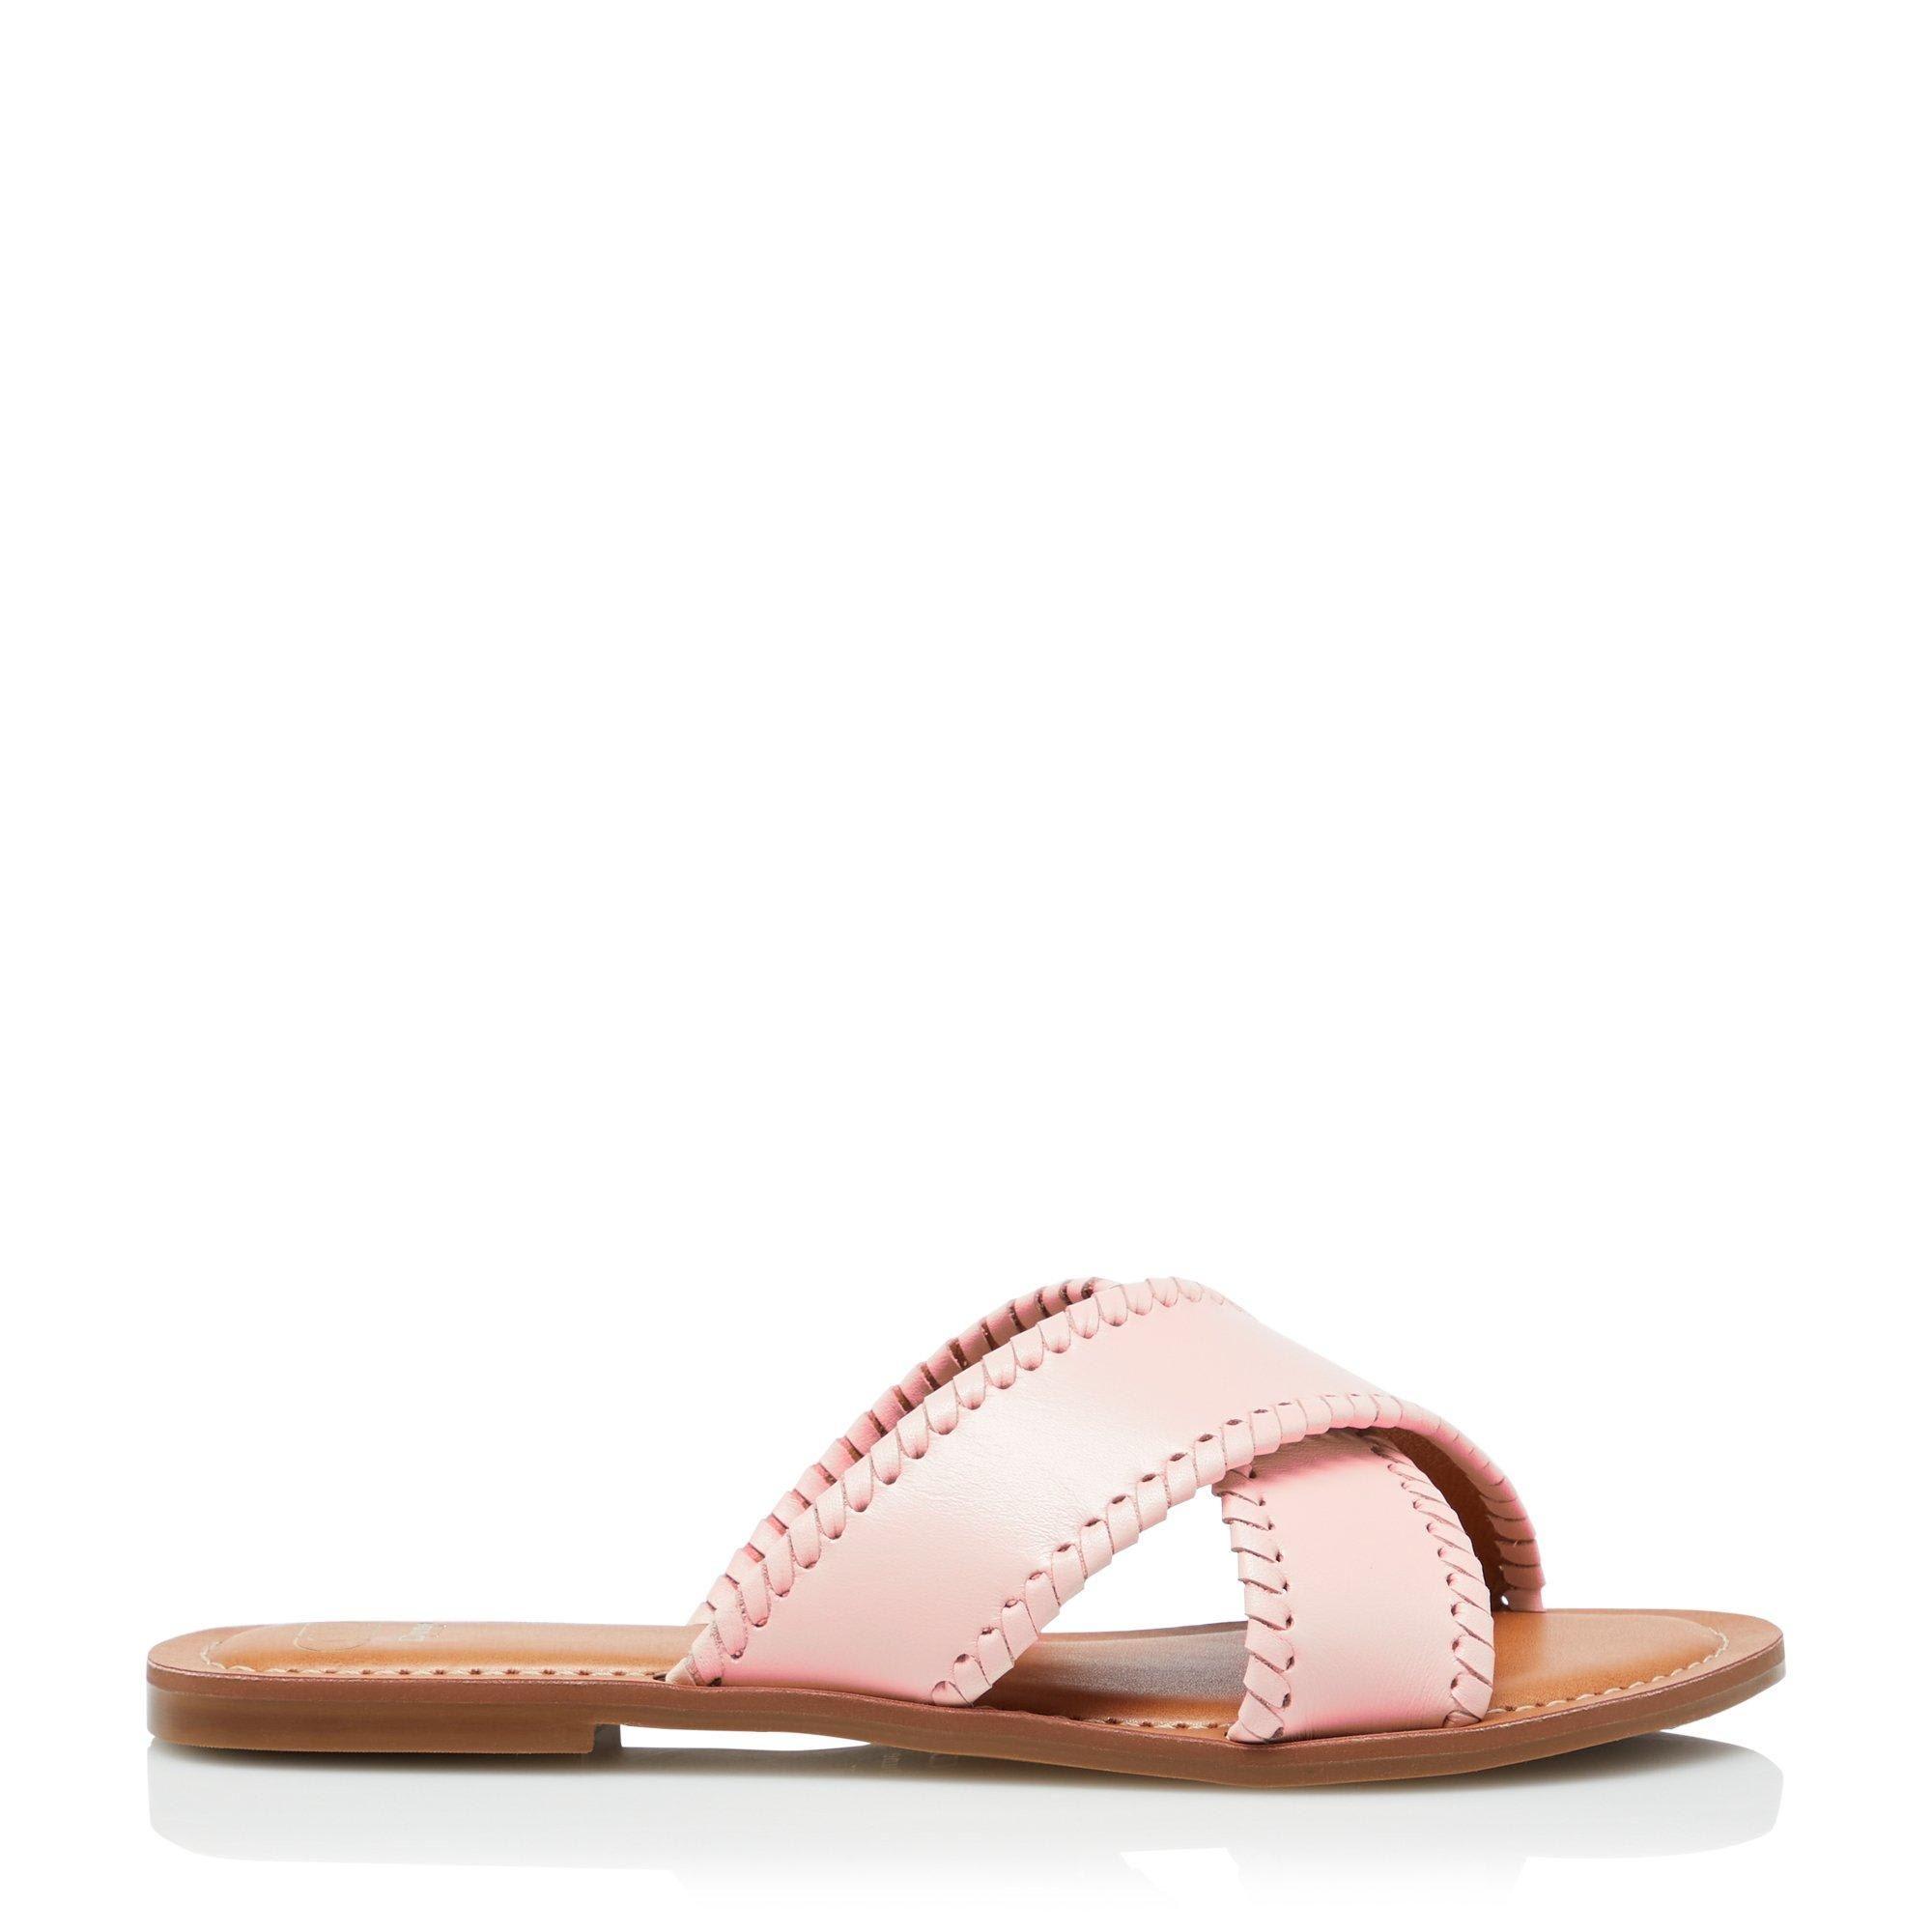 Dune Ladies LINDSY Cross Strap Whip Stitch Sandals